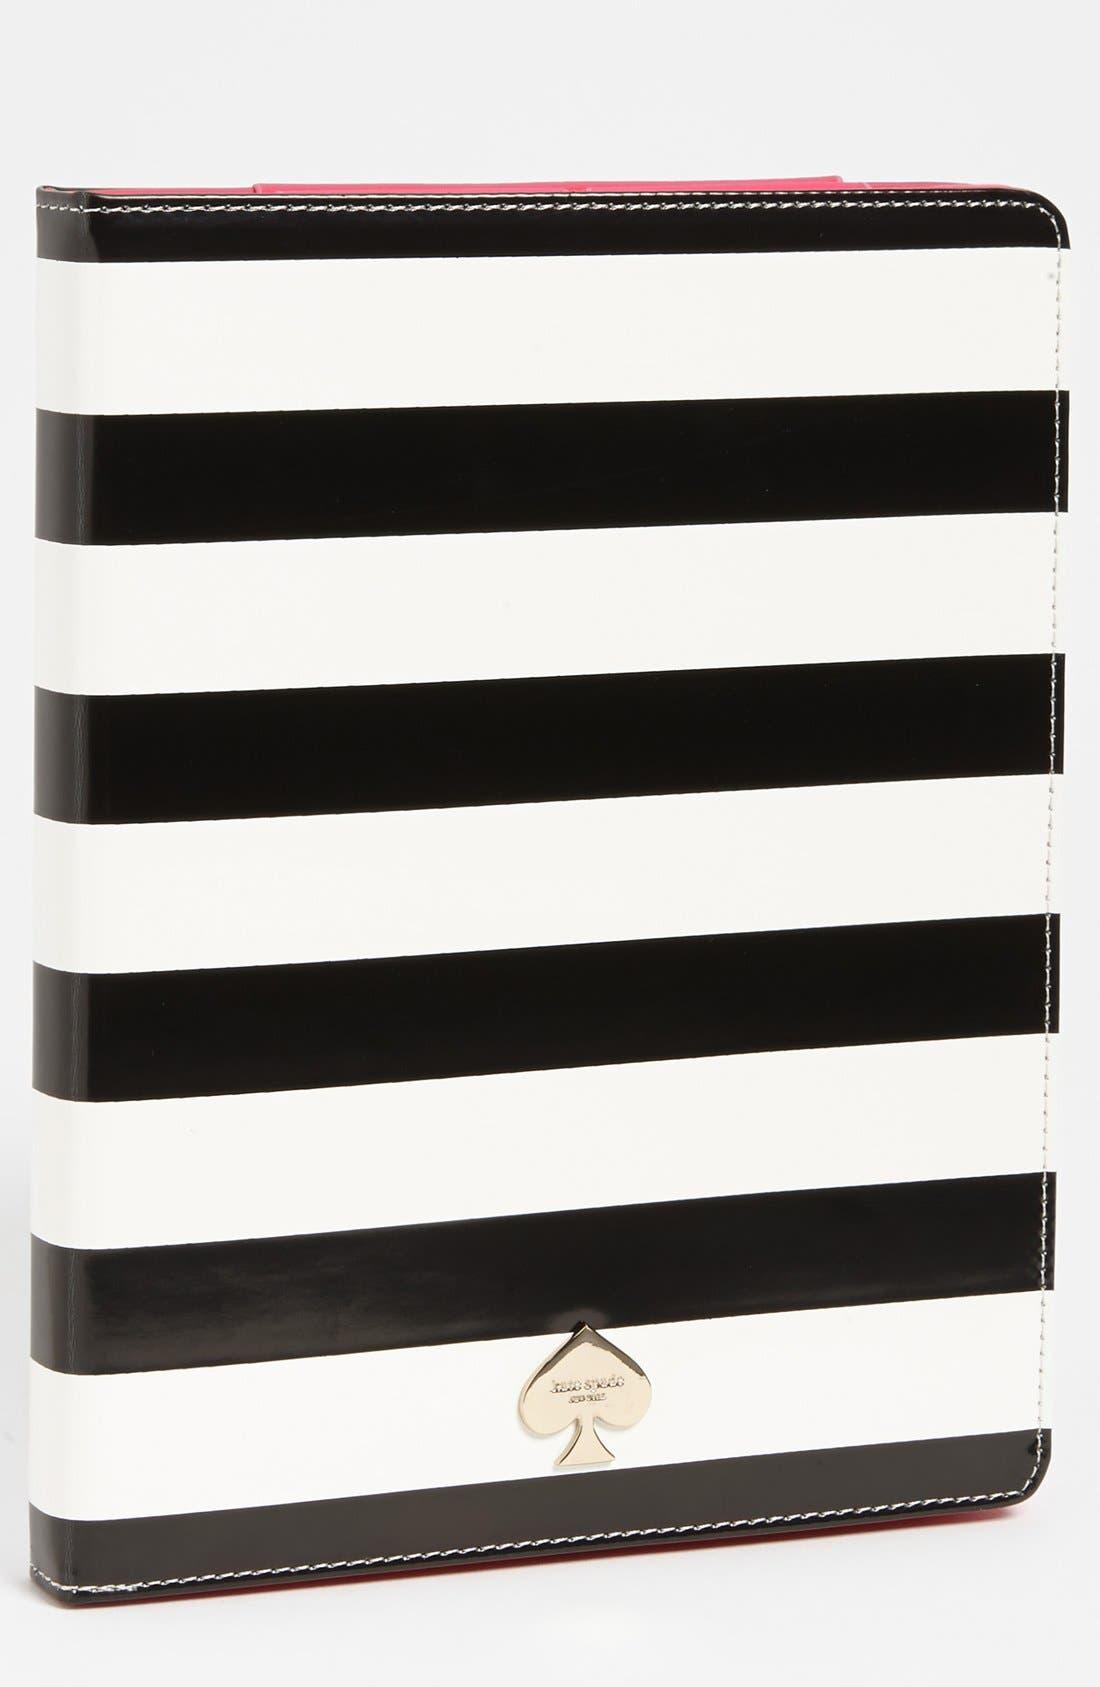 Main Image - kate spade new york 'petula stripe' iPad 2 & 3 folio